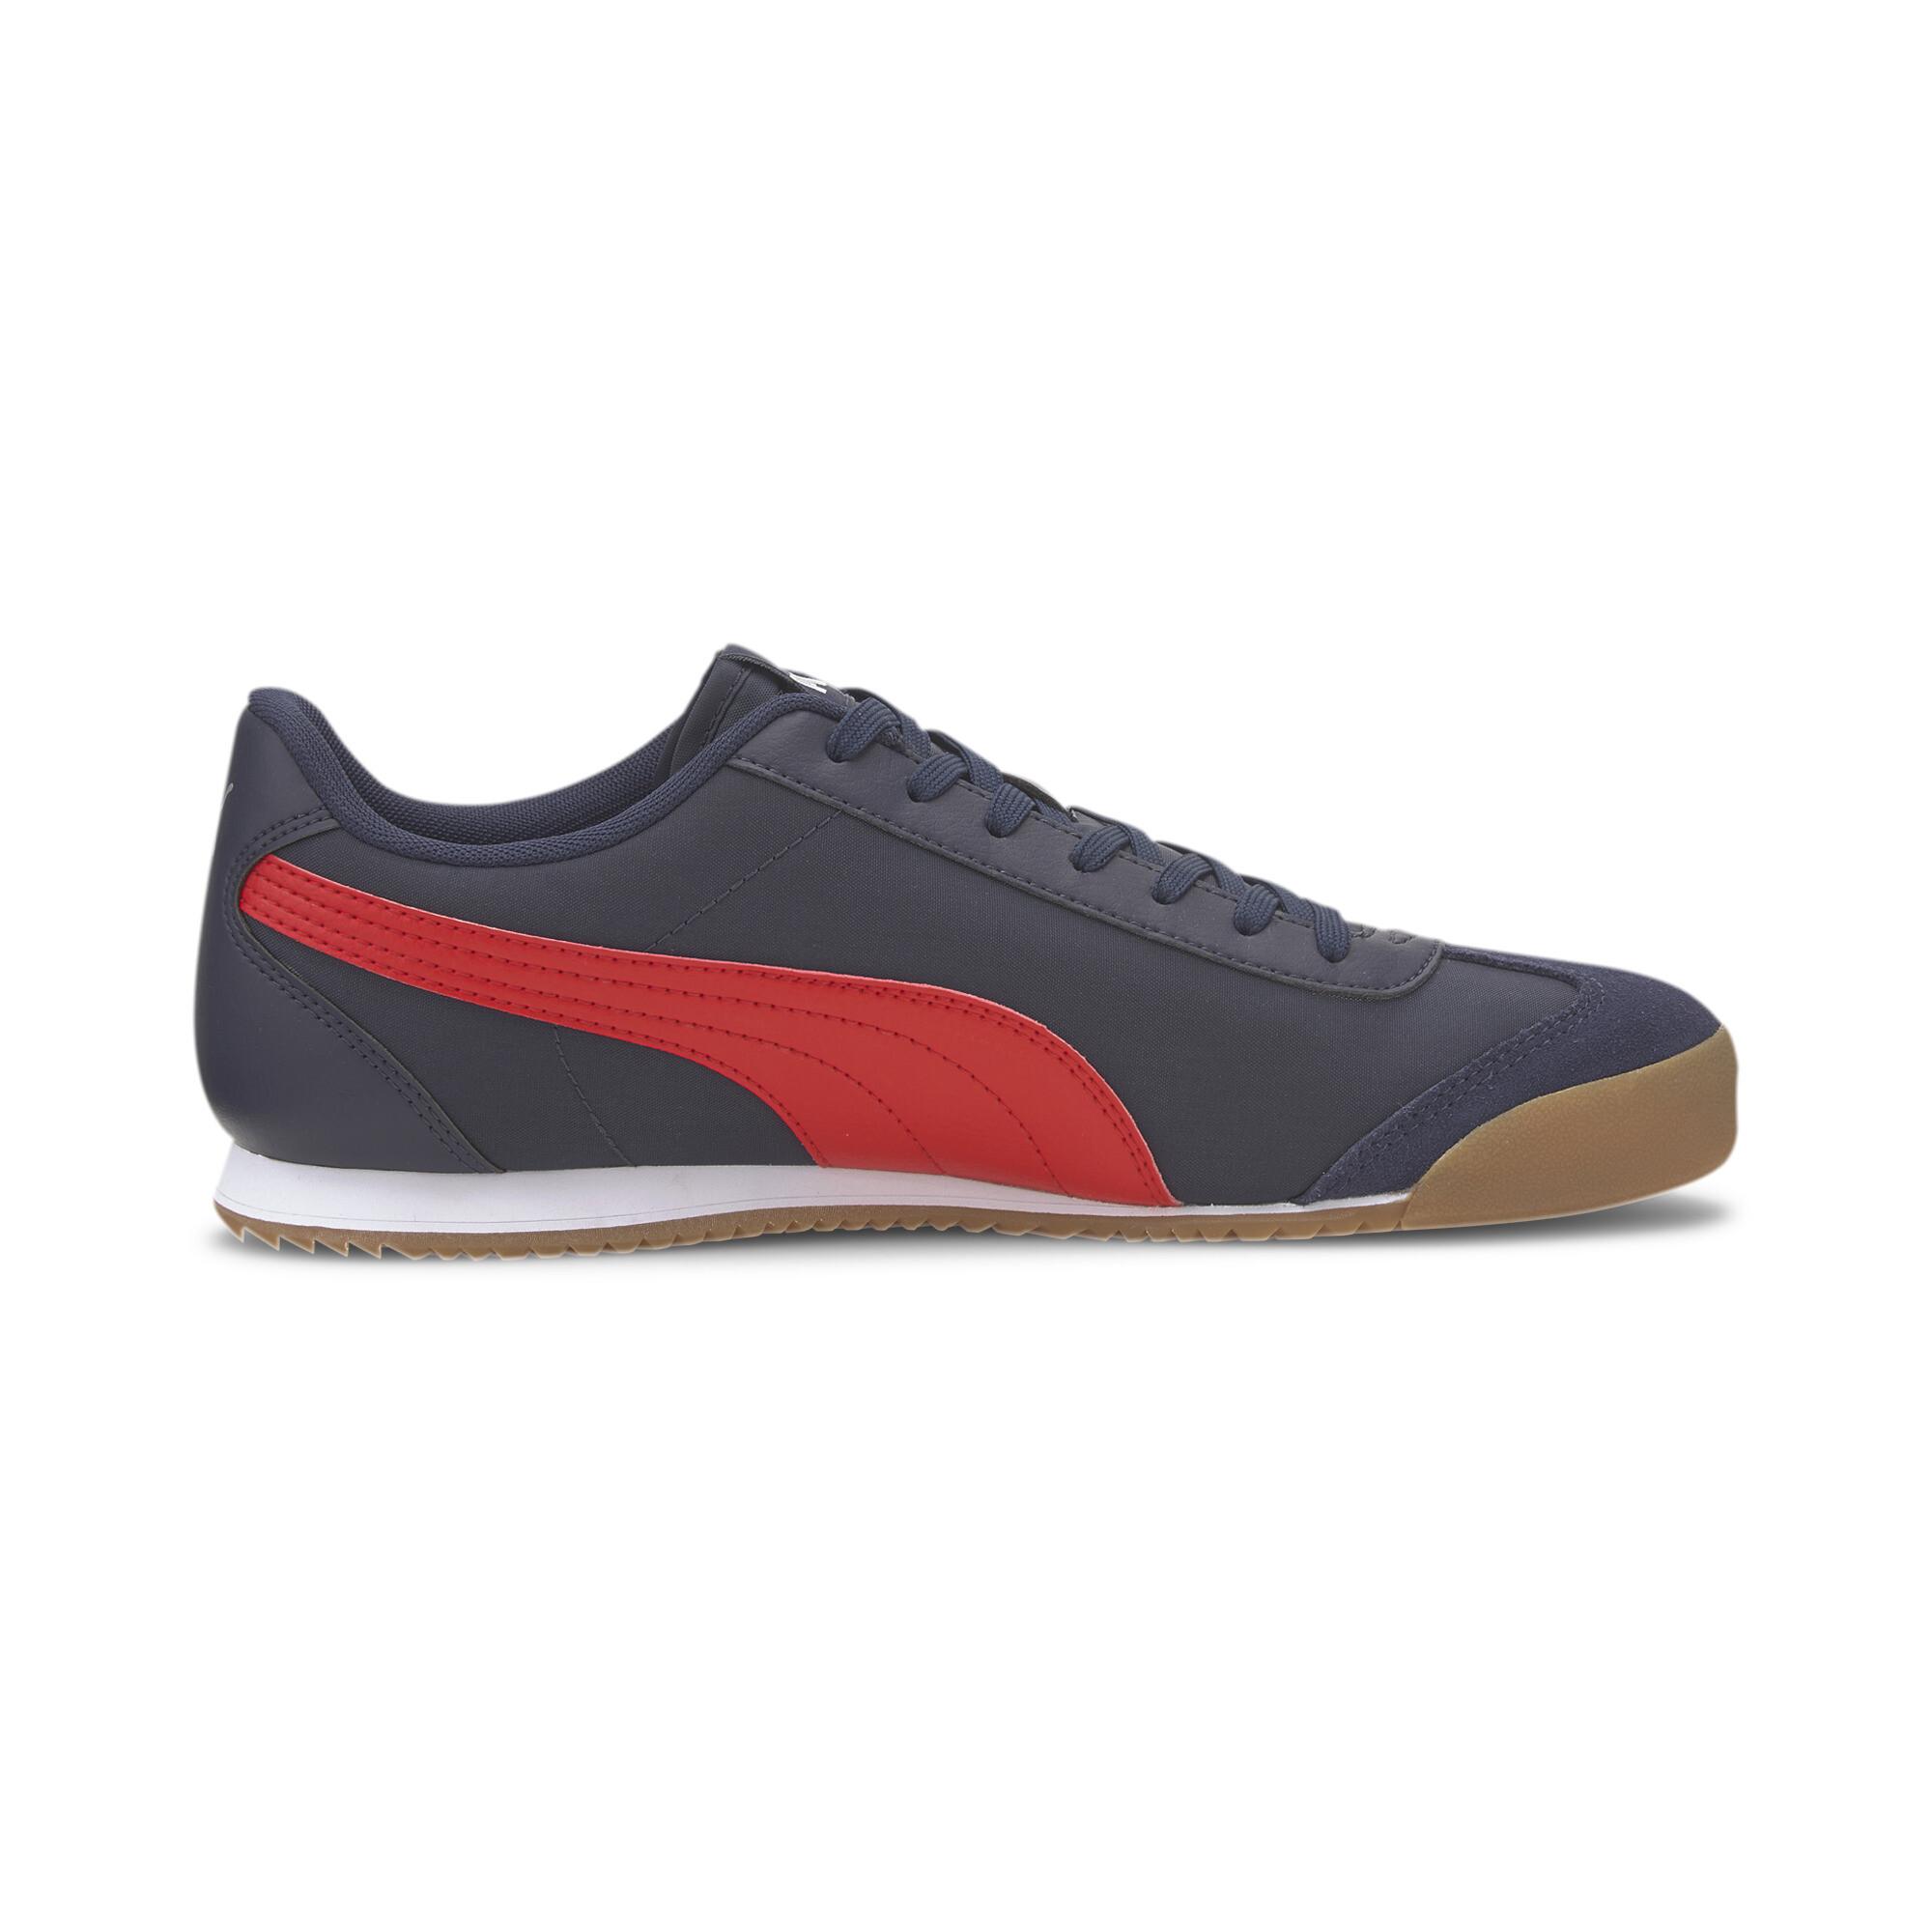 PUMA-Men-039-s-Turino-NL-Sneakers thumbnail 14